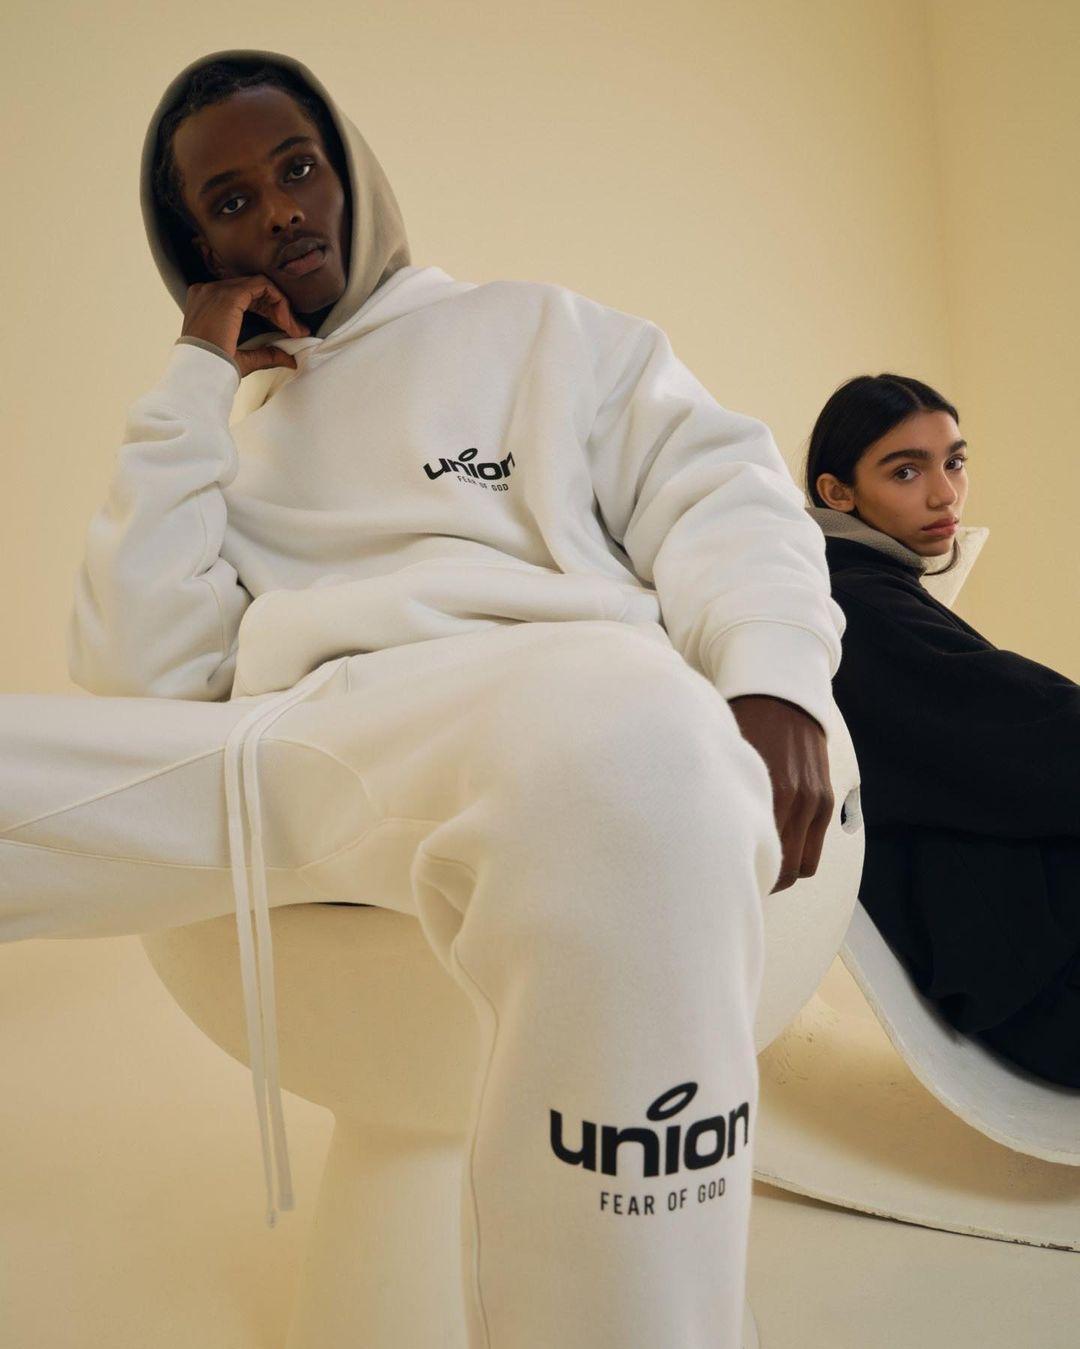 union-la-fear-of-god-essentials-release-2021-fall